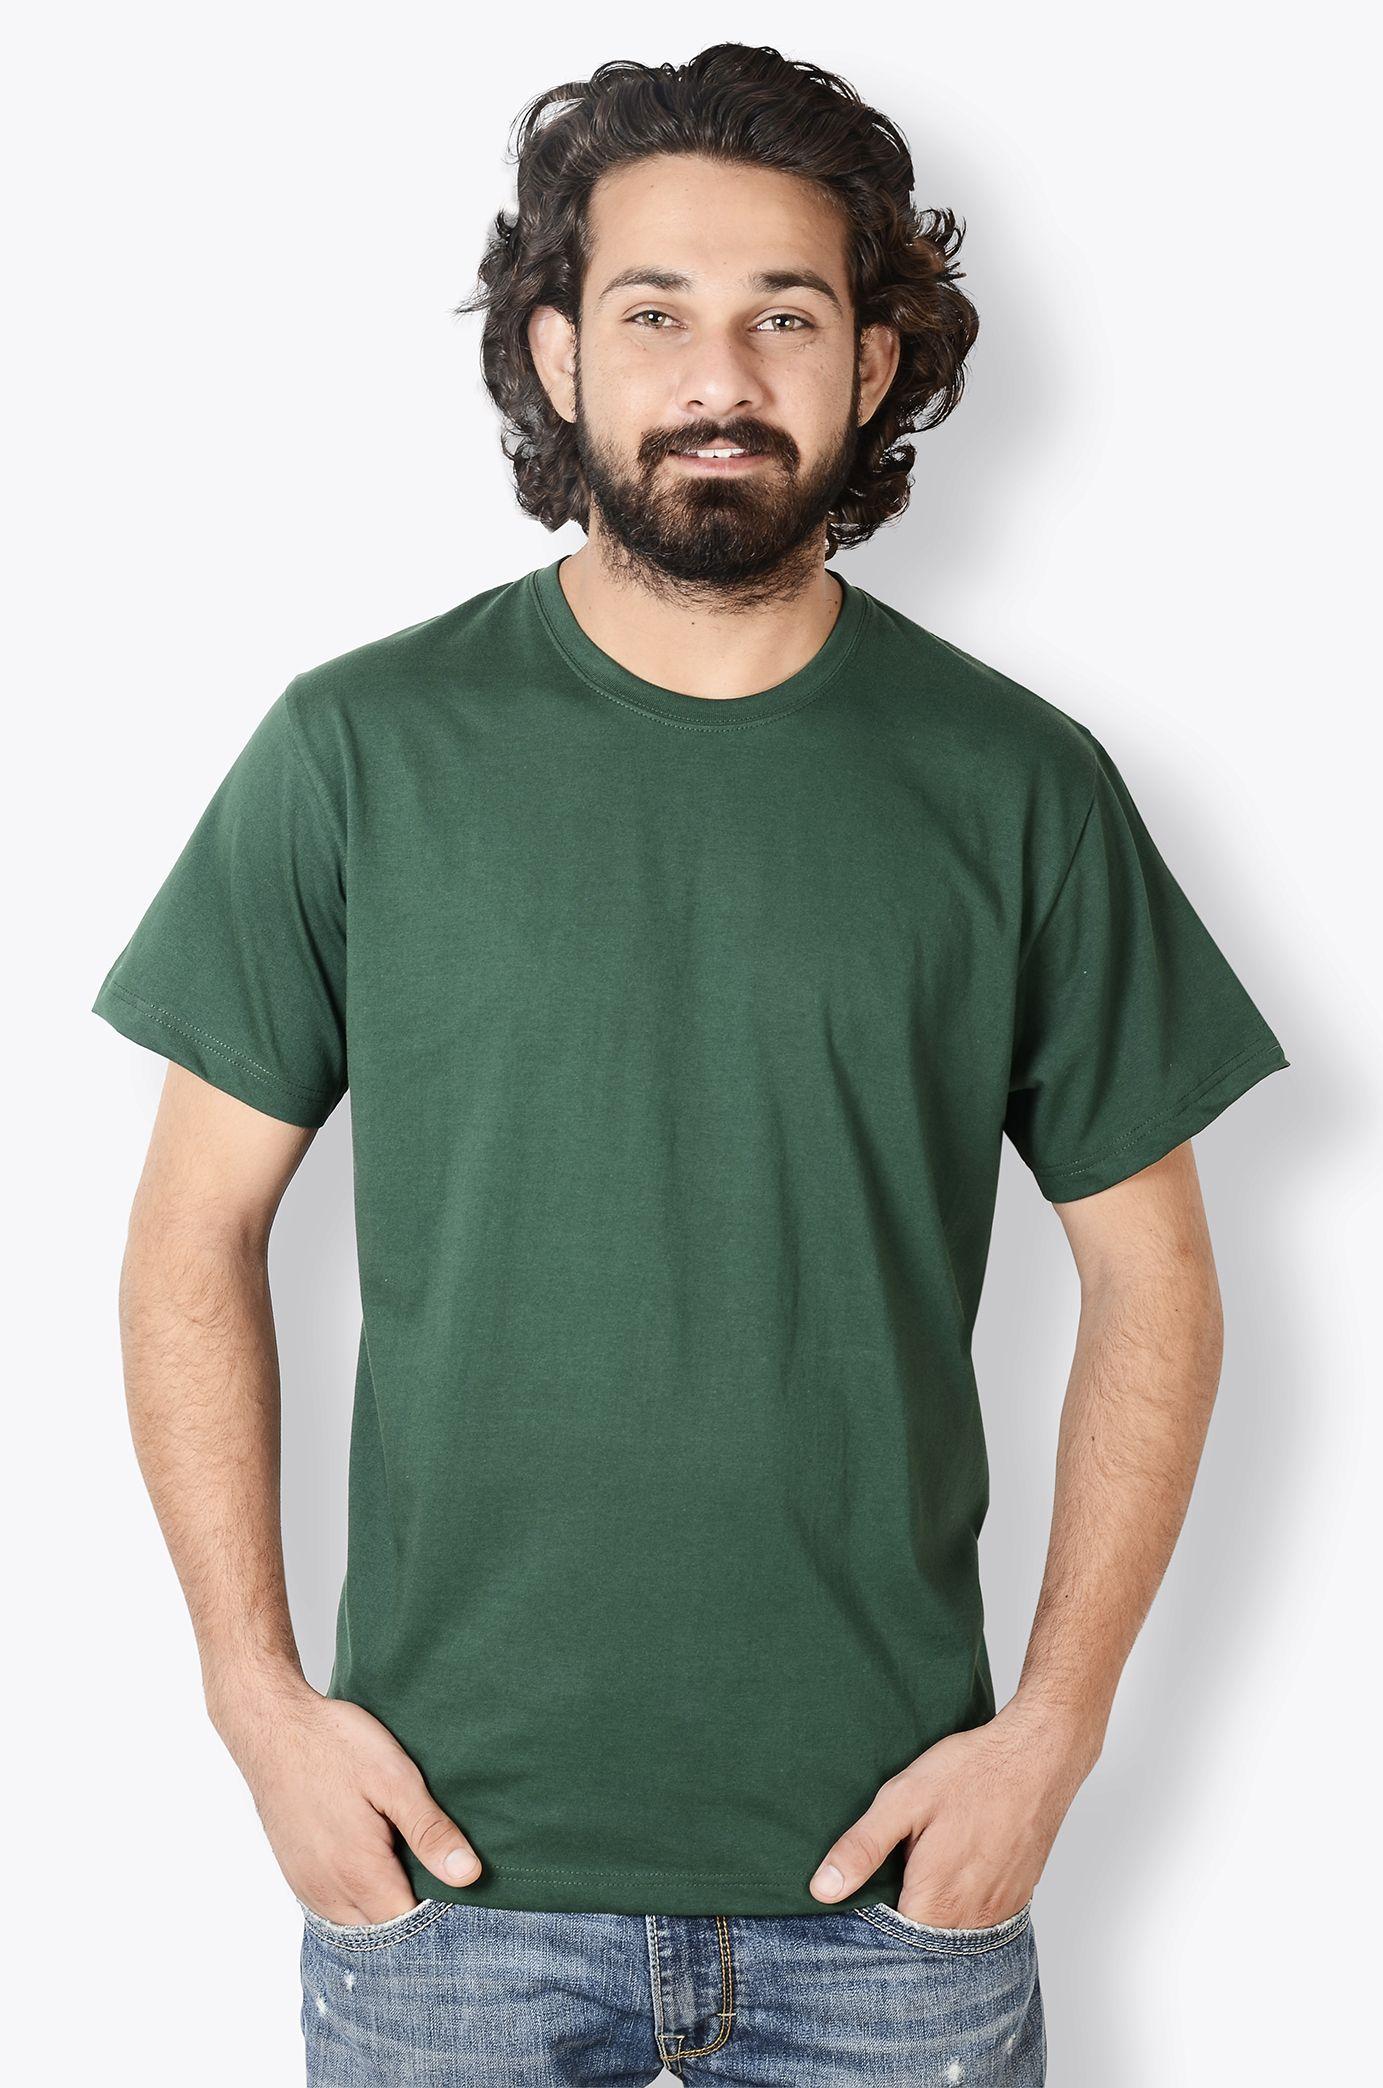 a8d4c87cb Men's Dark Green Round Neck T-Shirt Half Sleeve In stock Rs. 150.00 http